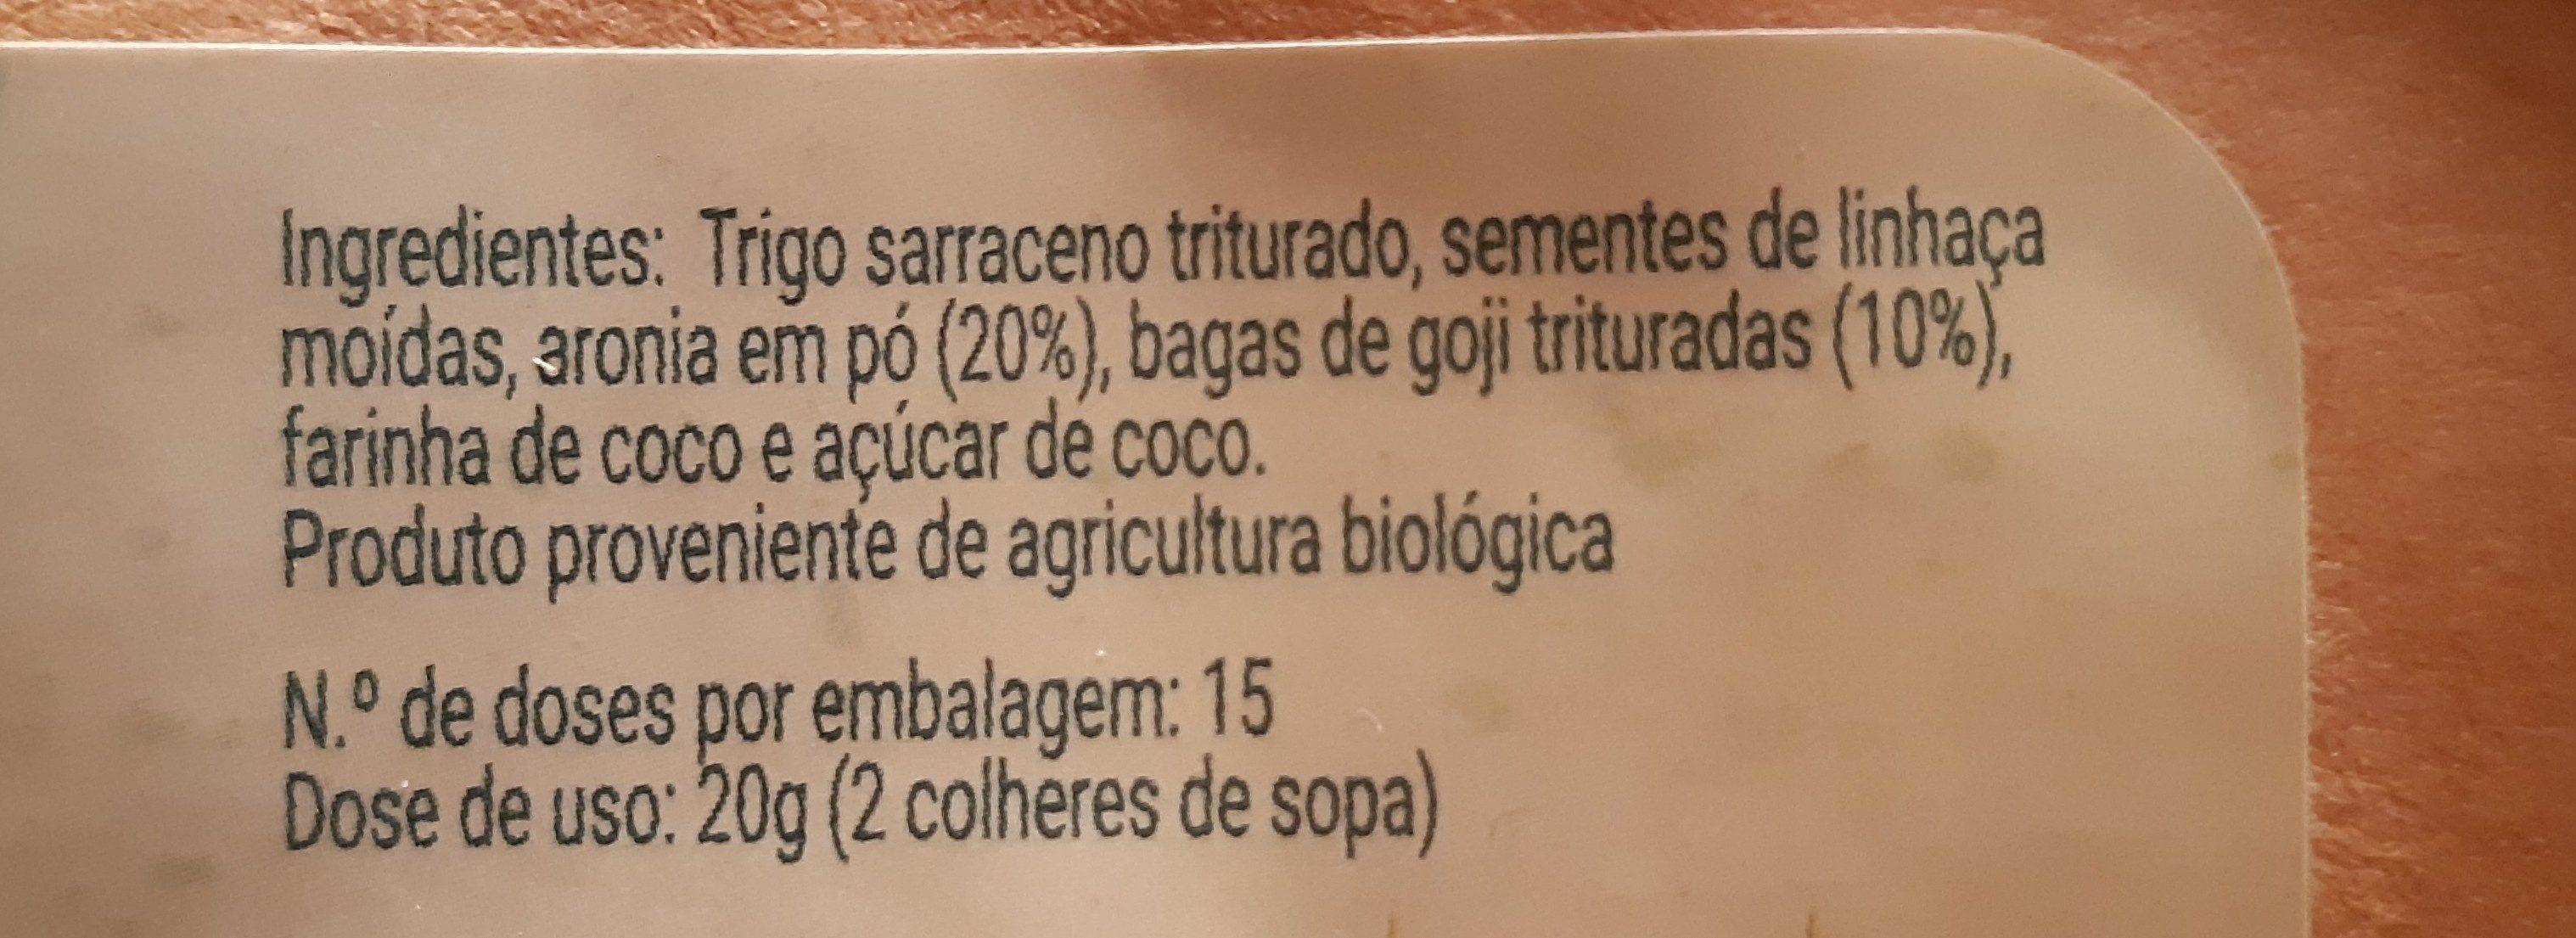 Pequeno Almoço Instantâneo - Vitaminas - Ingrédients